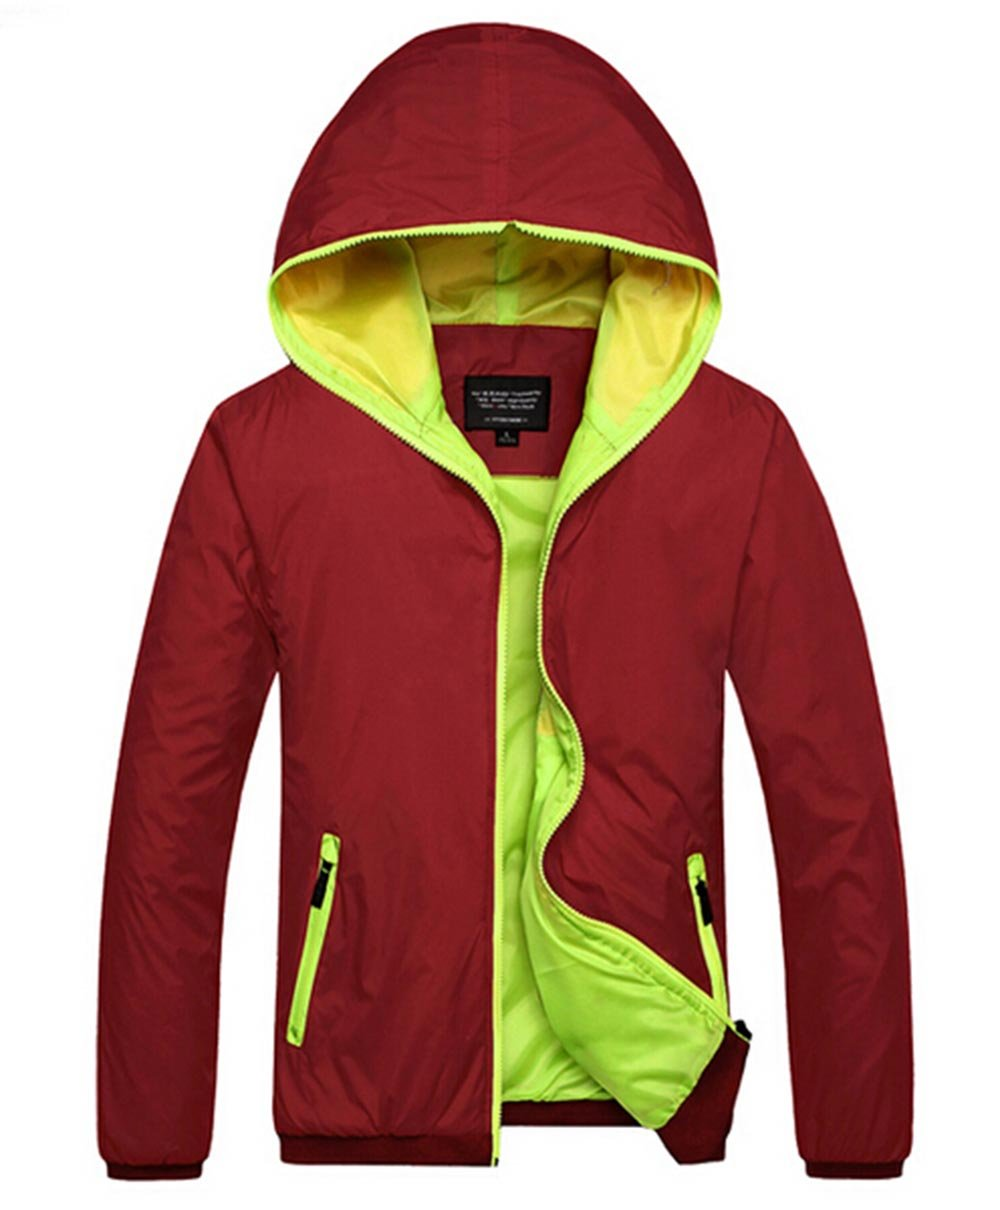 Amcupider Big Boys Hooded Rain Quick Dry Jacket Windbreaker by Amcupider